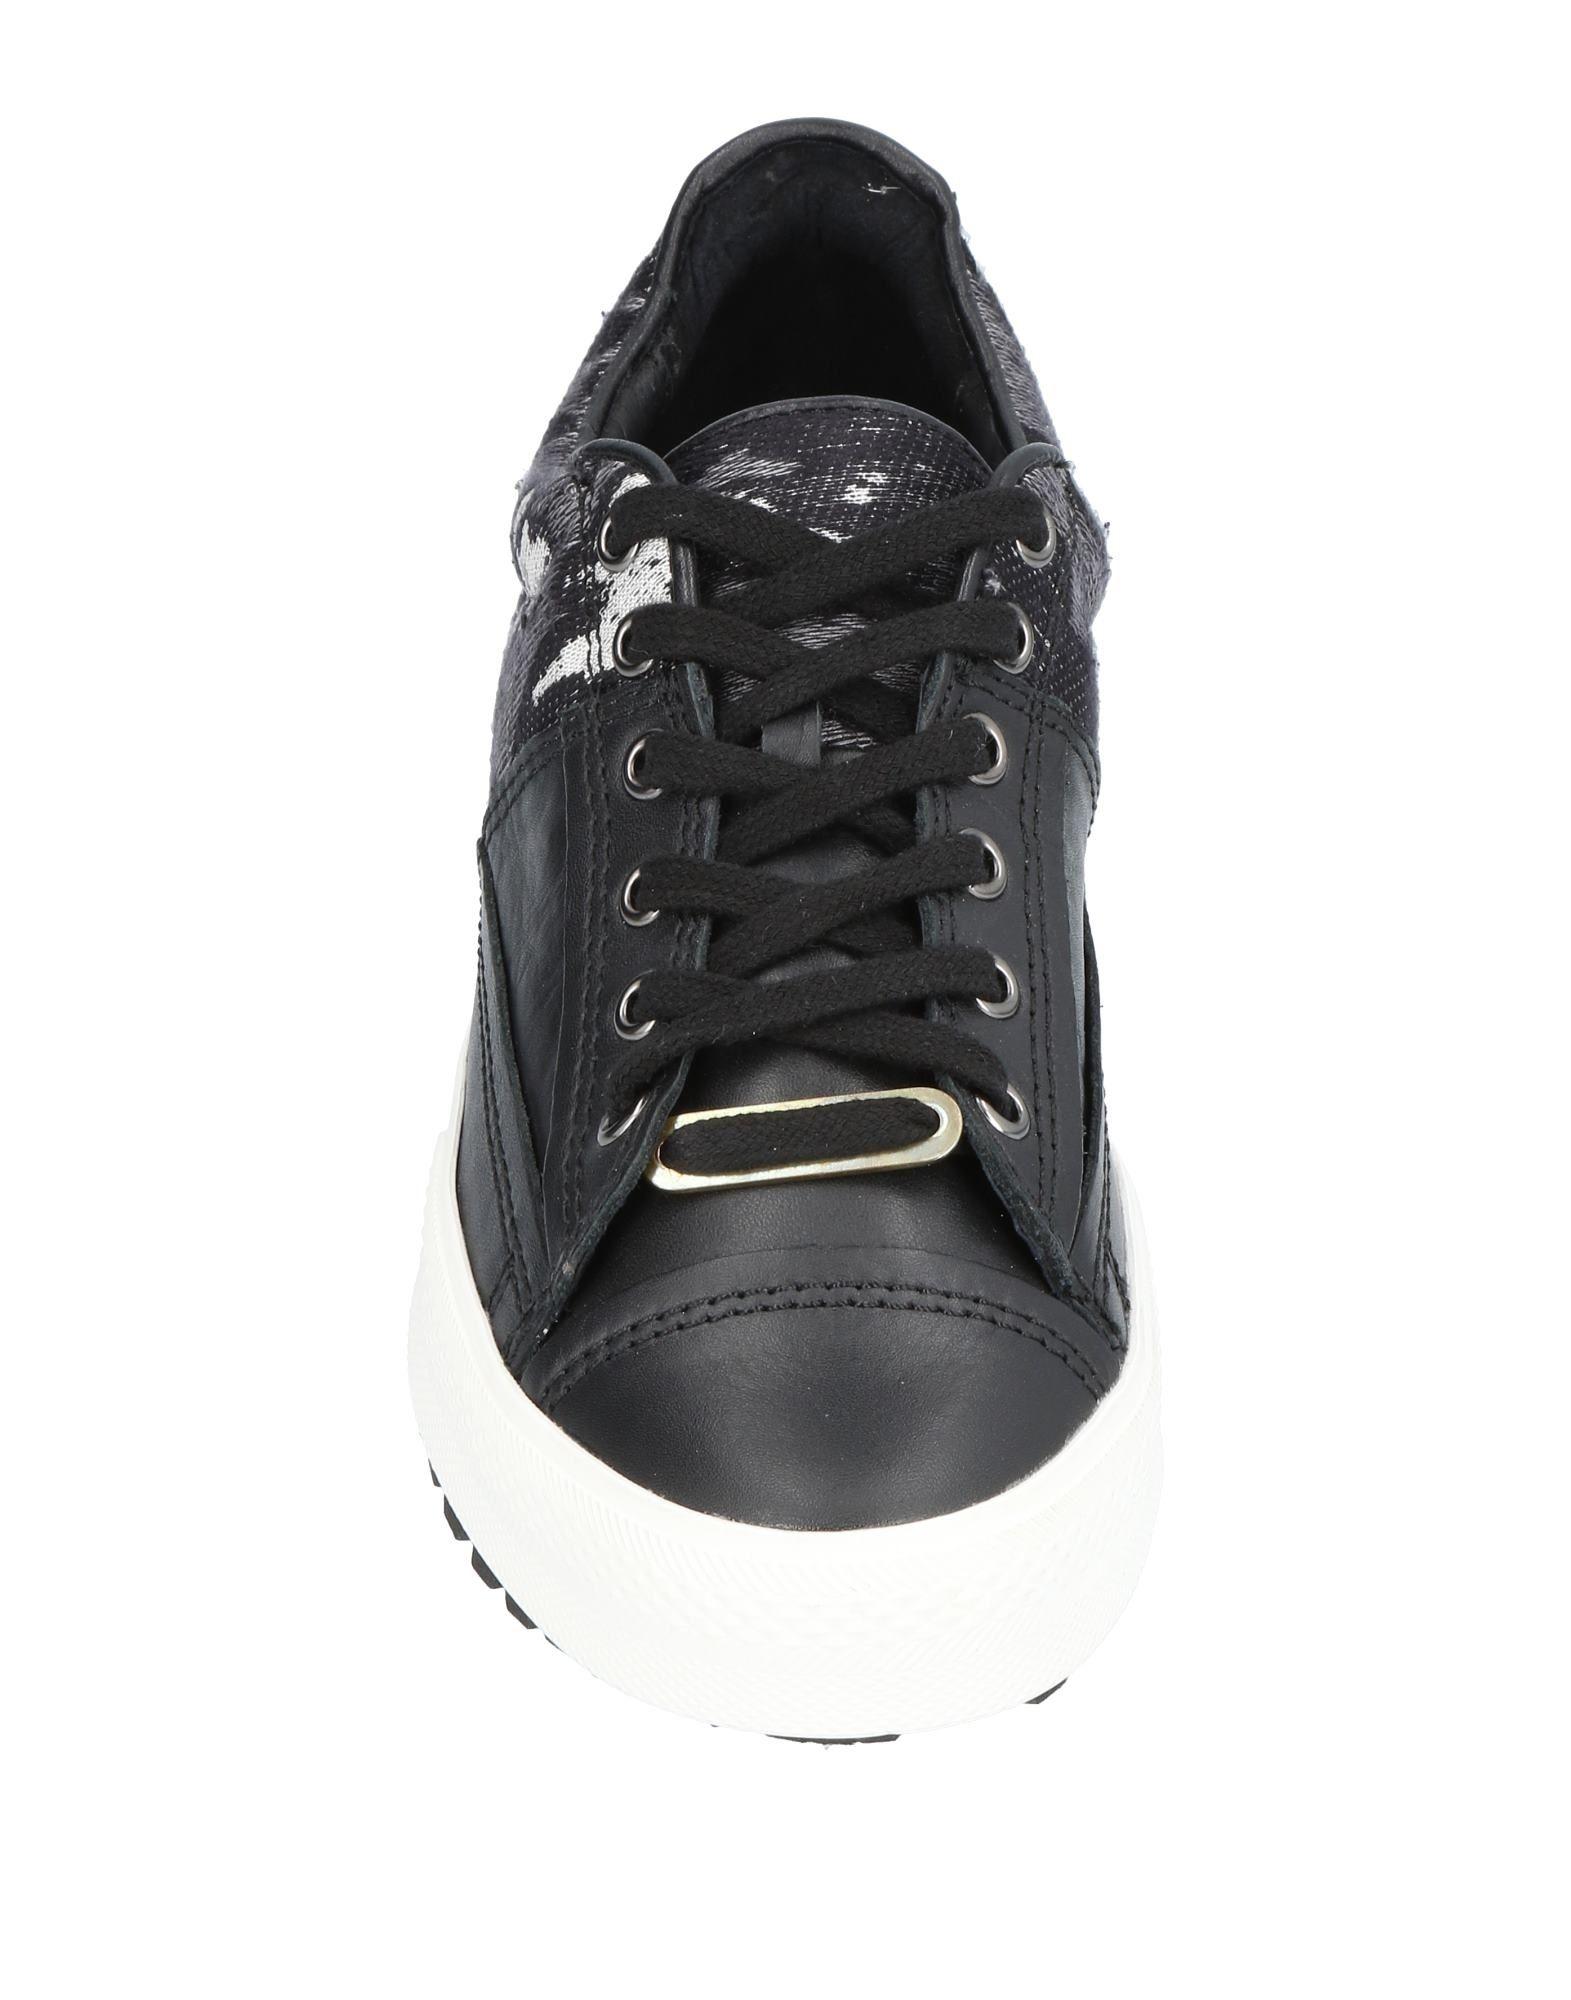 Sneakers Miharayasuhiro Femme - Sneakers Miharayasuhiro sur